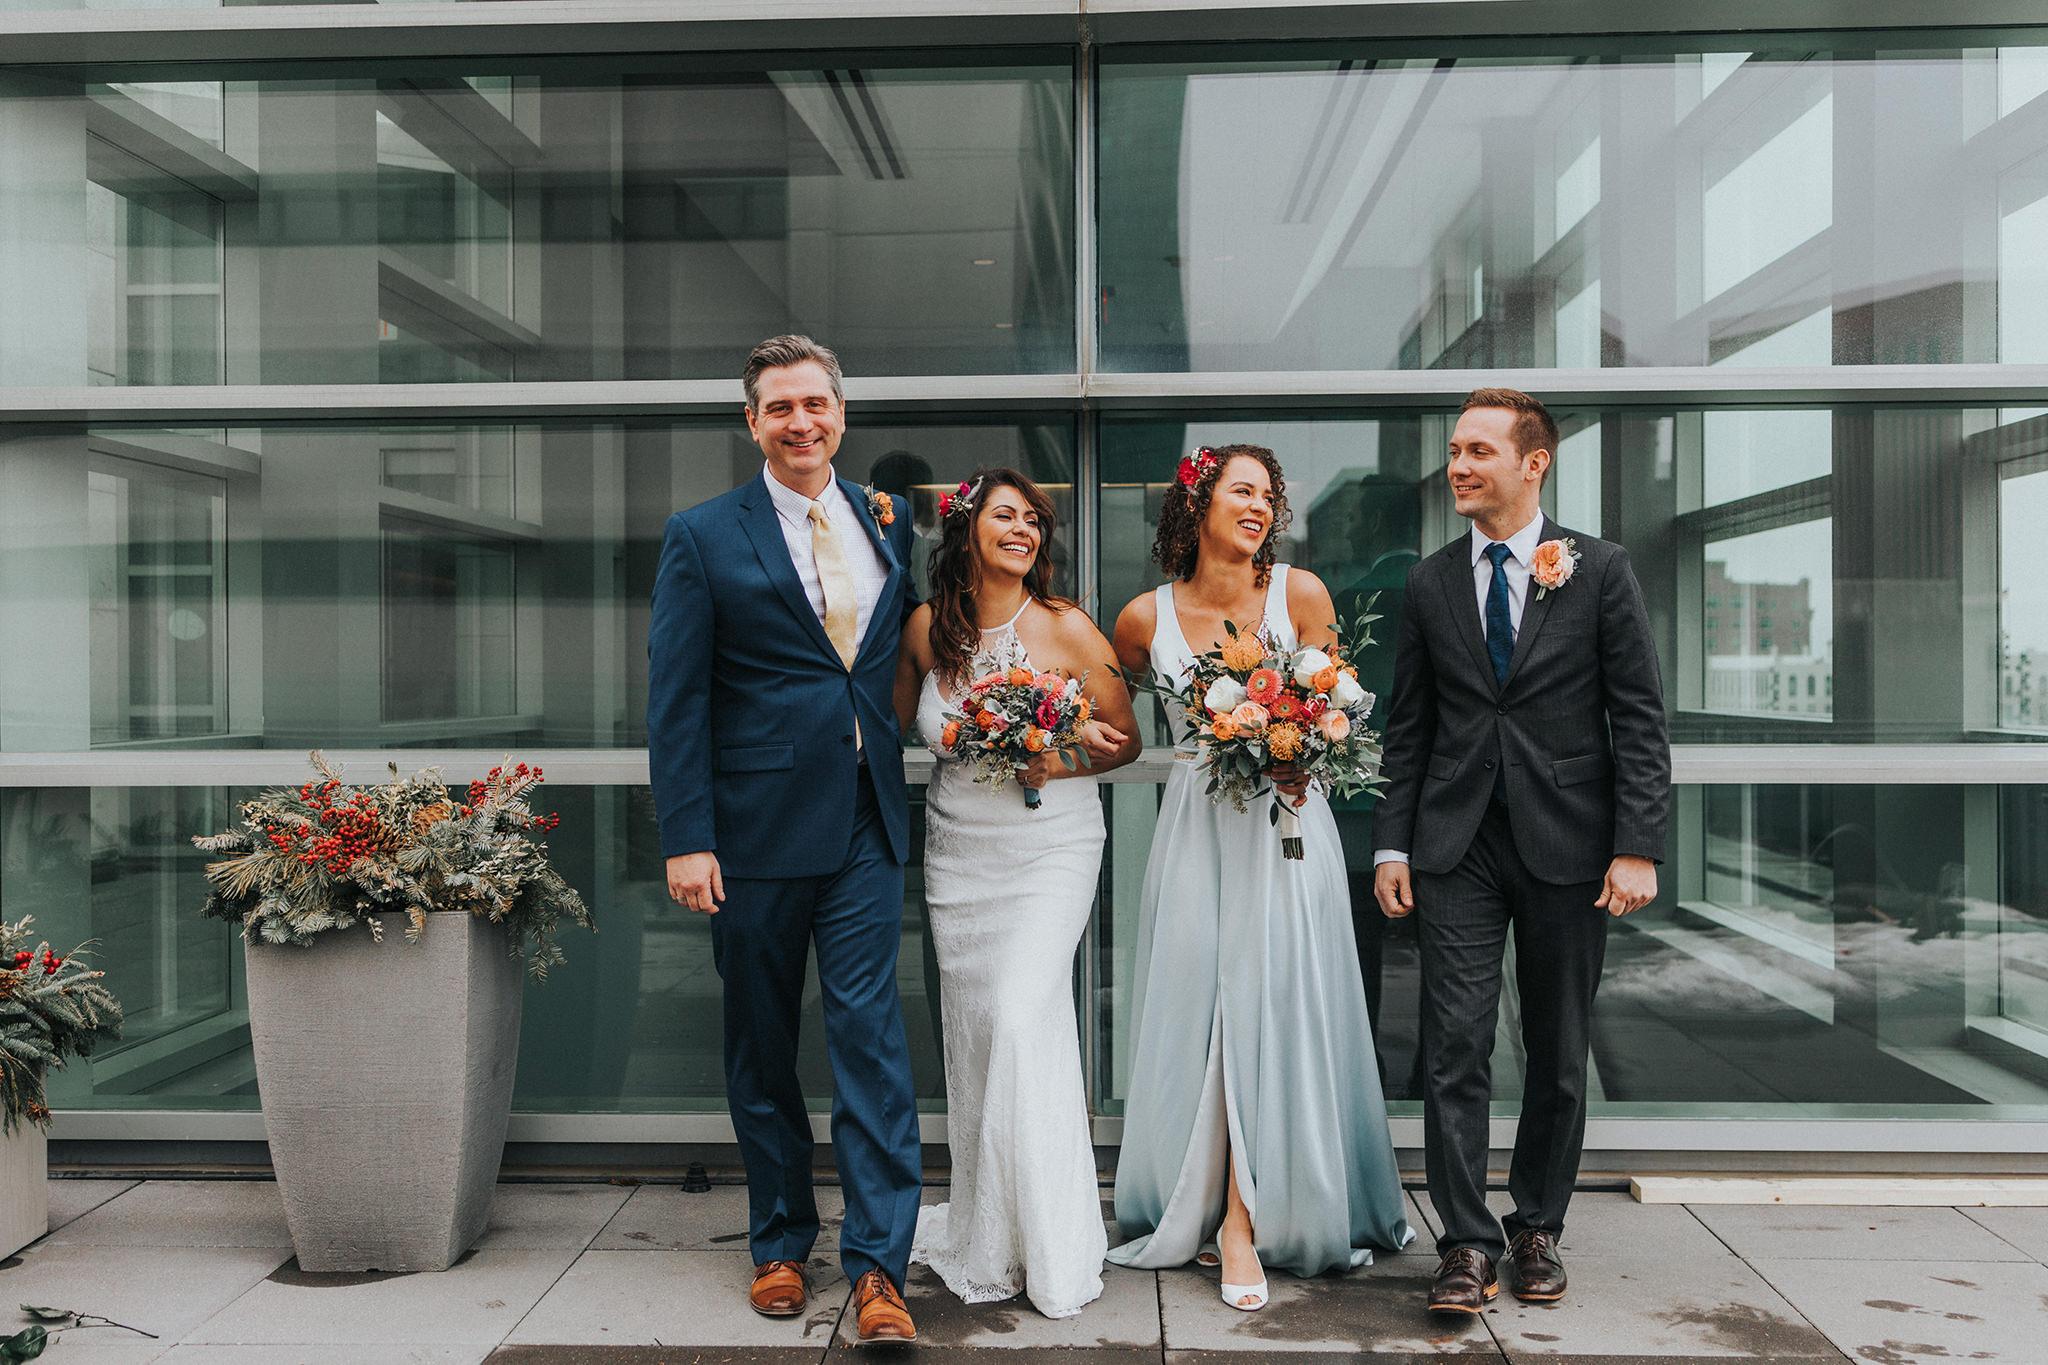 177 omaha-wedding-photographer-planner-tiny-luxe-velvet-sage.jpg